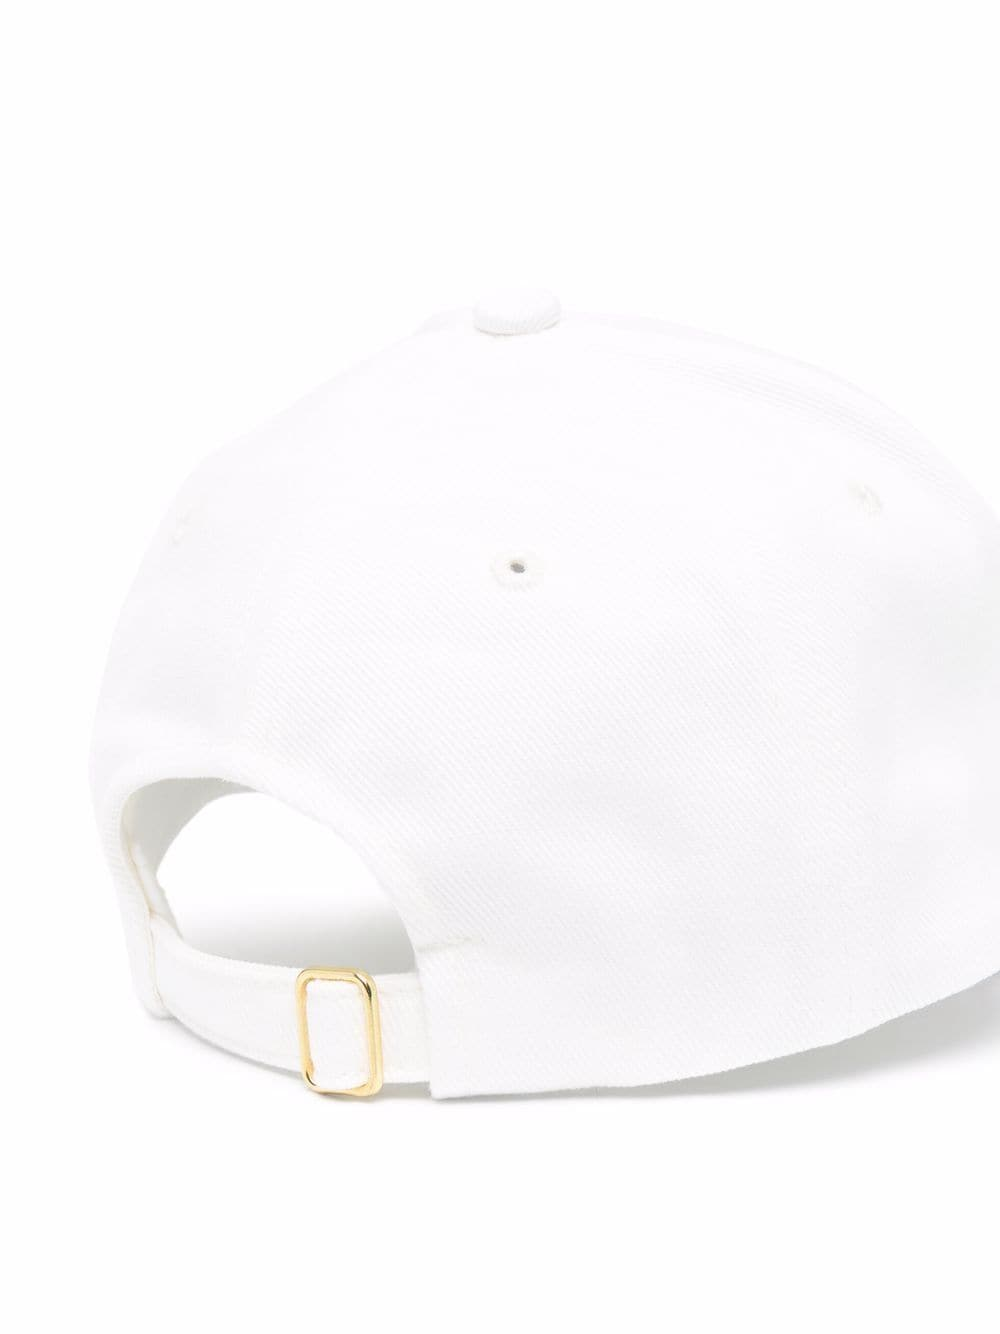 cappello racing twill uomo bianco in cotone CASABLANCA   Cappelli   AF21-HAT-008OFF WHITE CASABLANCA RACING